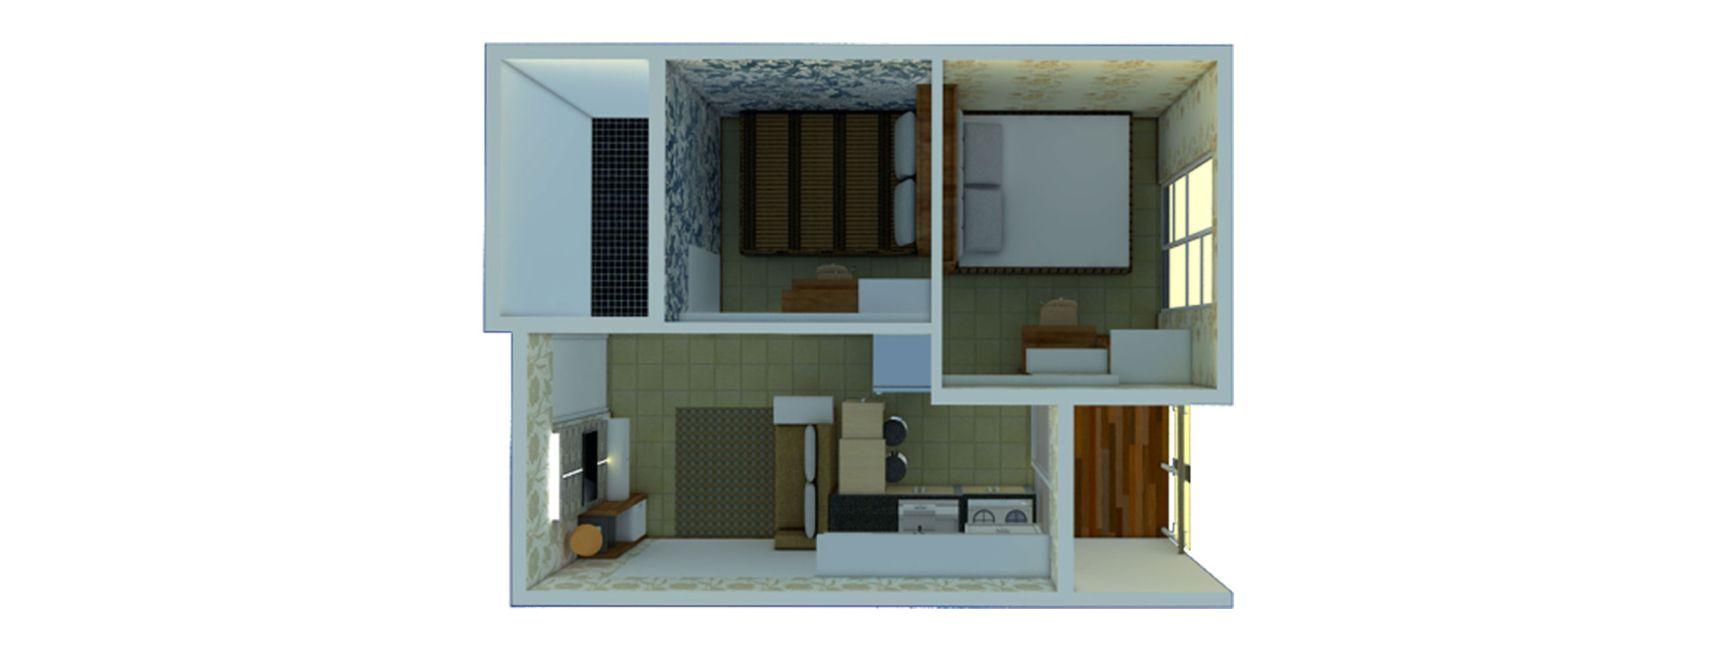 Residensial Jogja Apartel Tipe 2BR di Yogyakarta